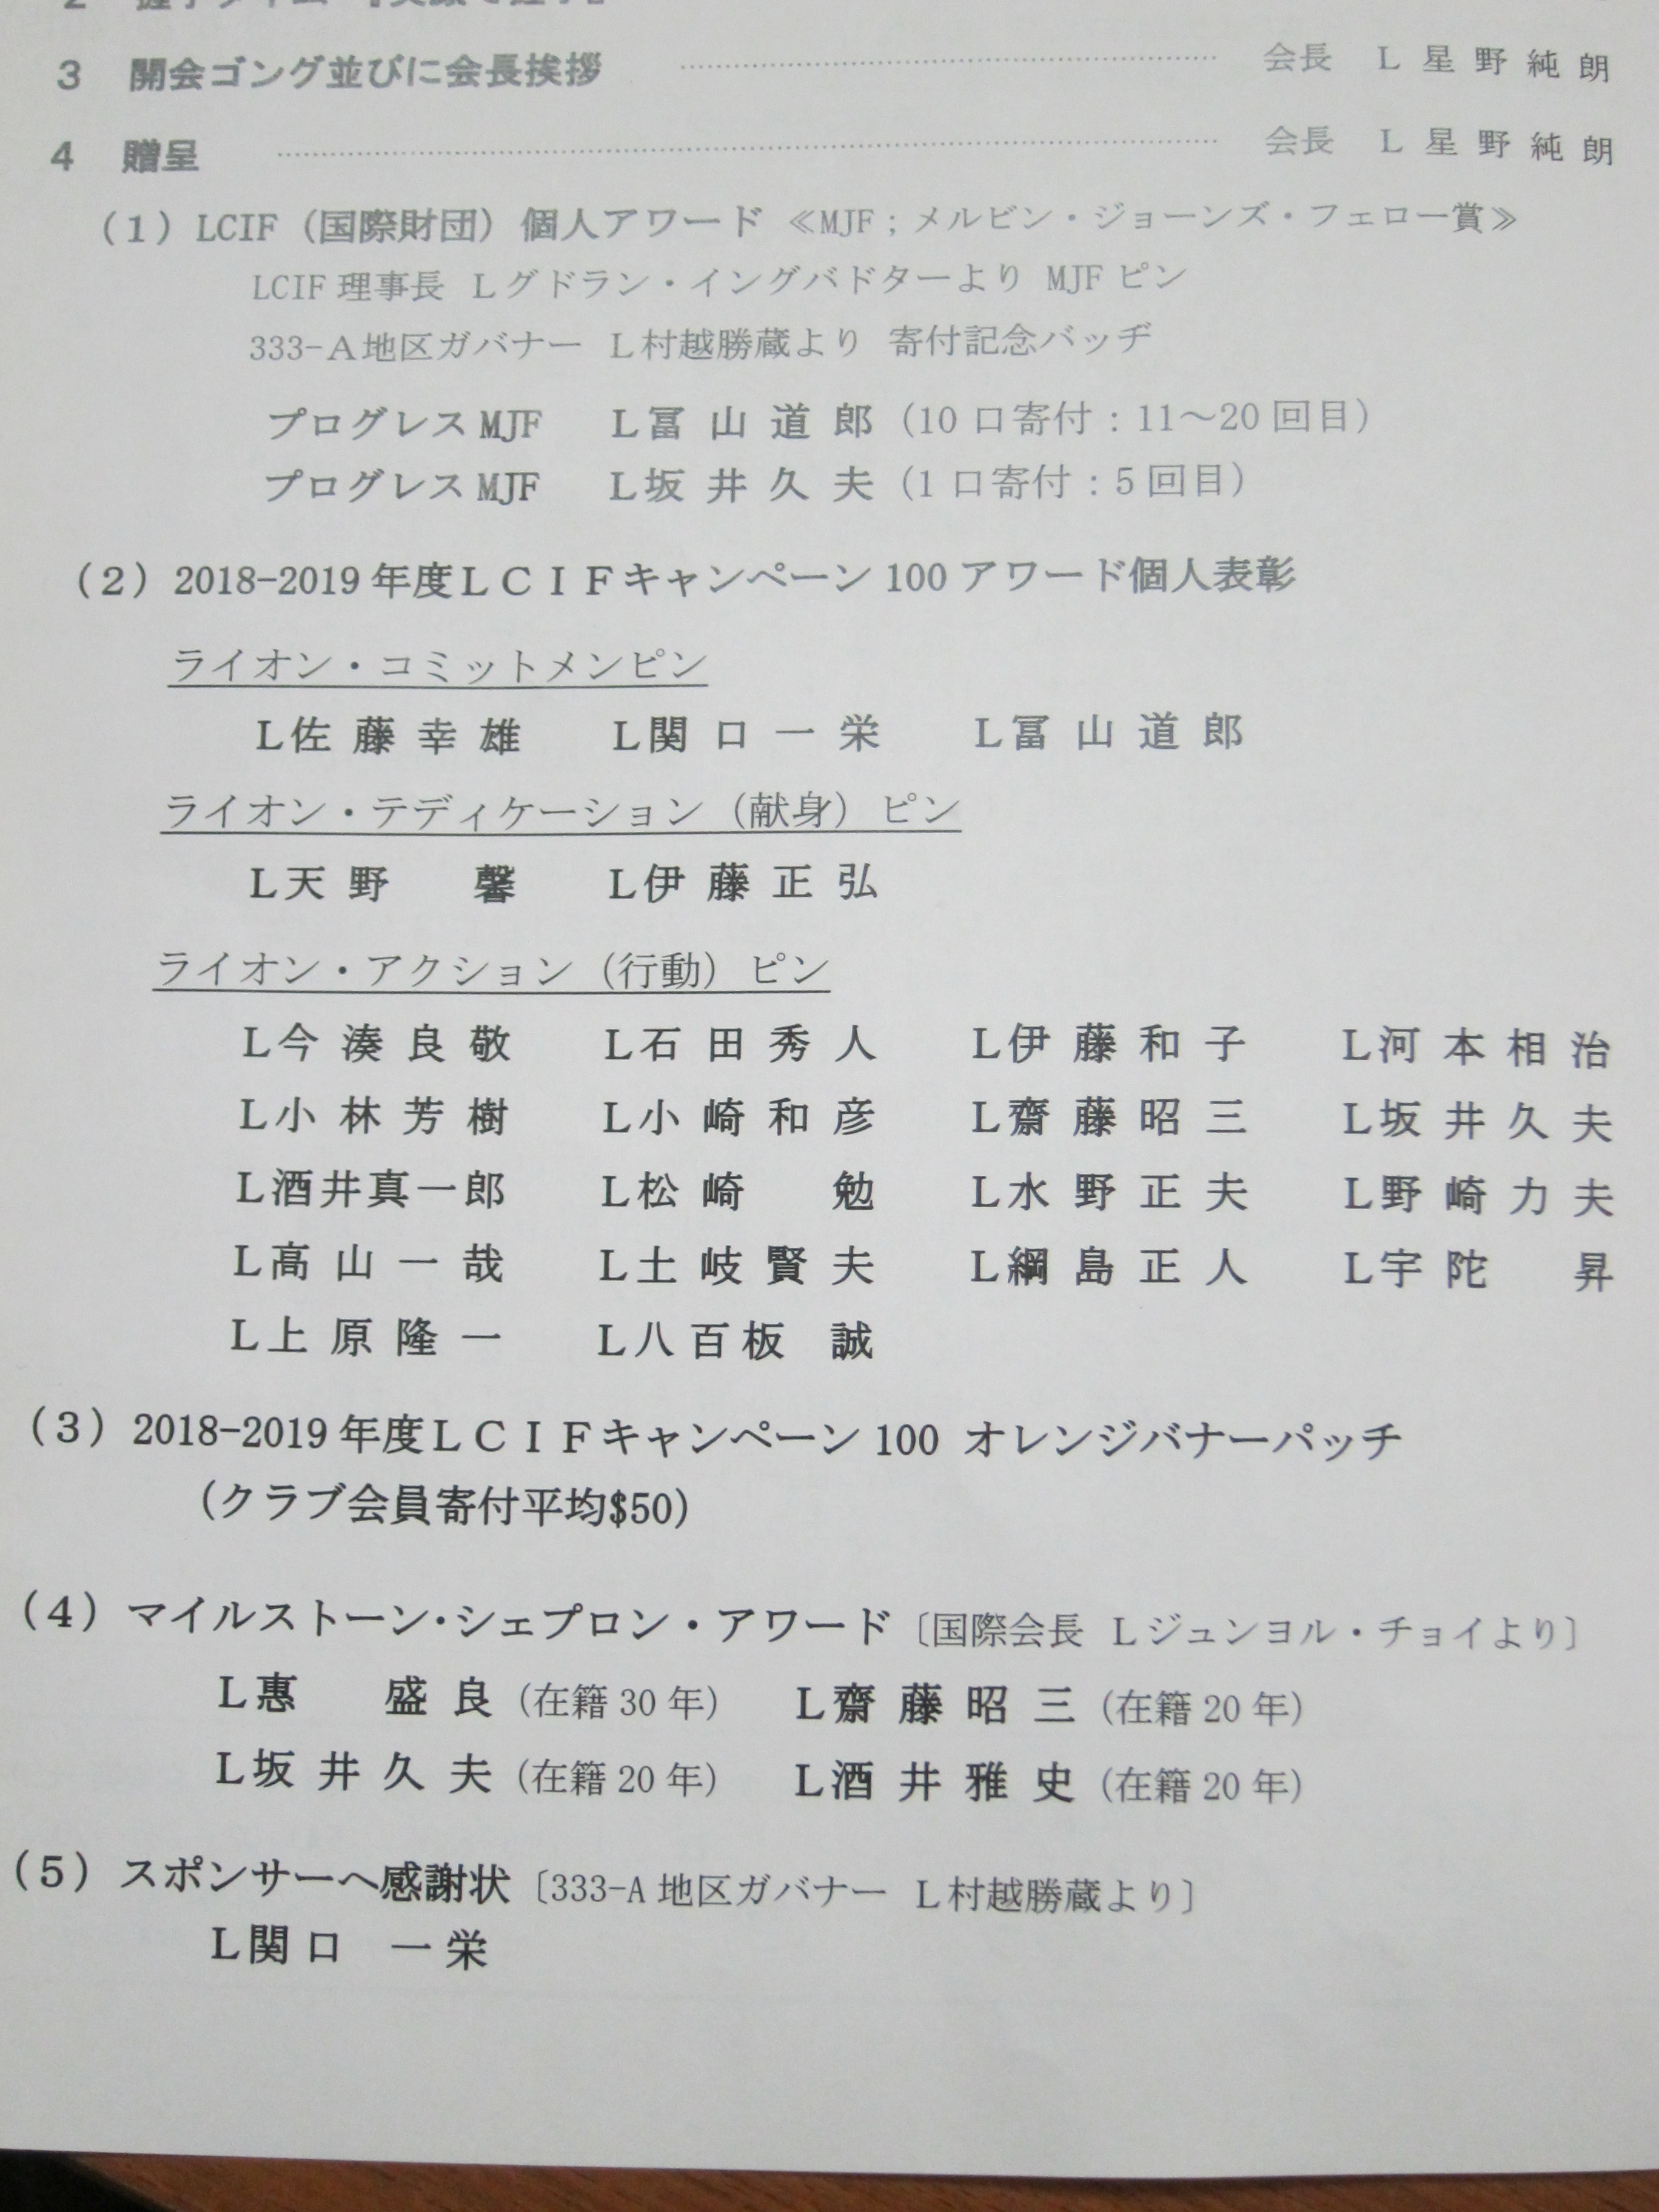 http://www.niigatalions.com/IMG_1561.JPG